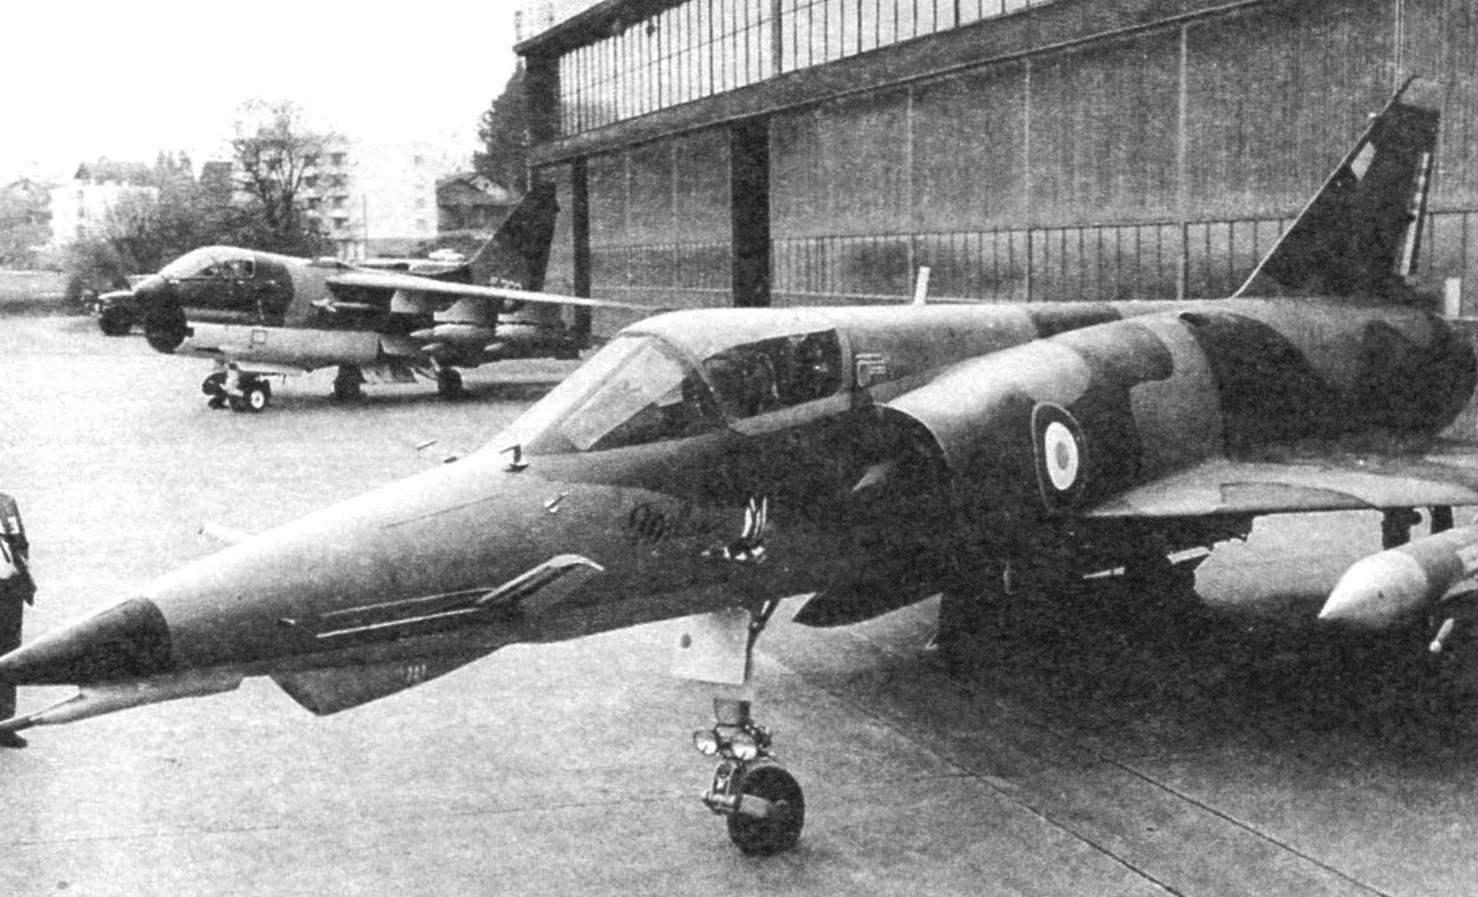 «Милан» на испытаниях в Швейцарии. На заднем плане - американский конкурент - самолёт А-7G «Корсар» II